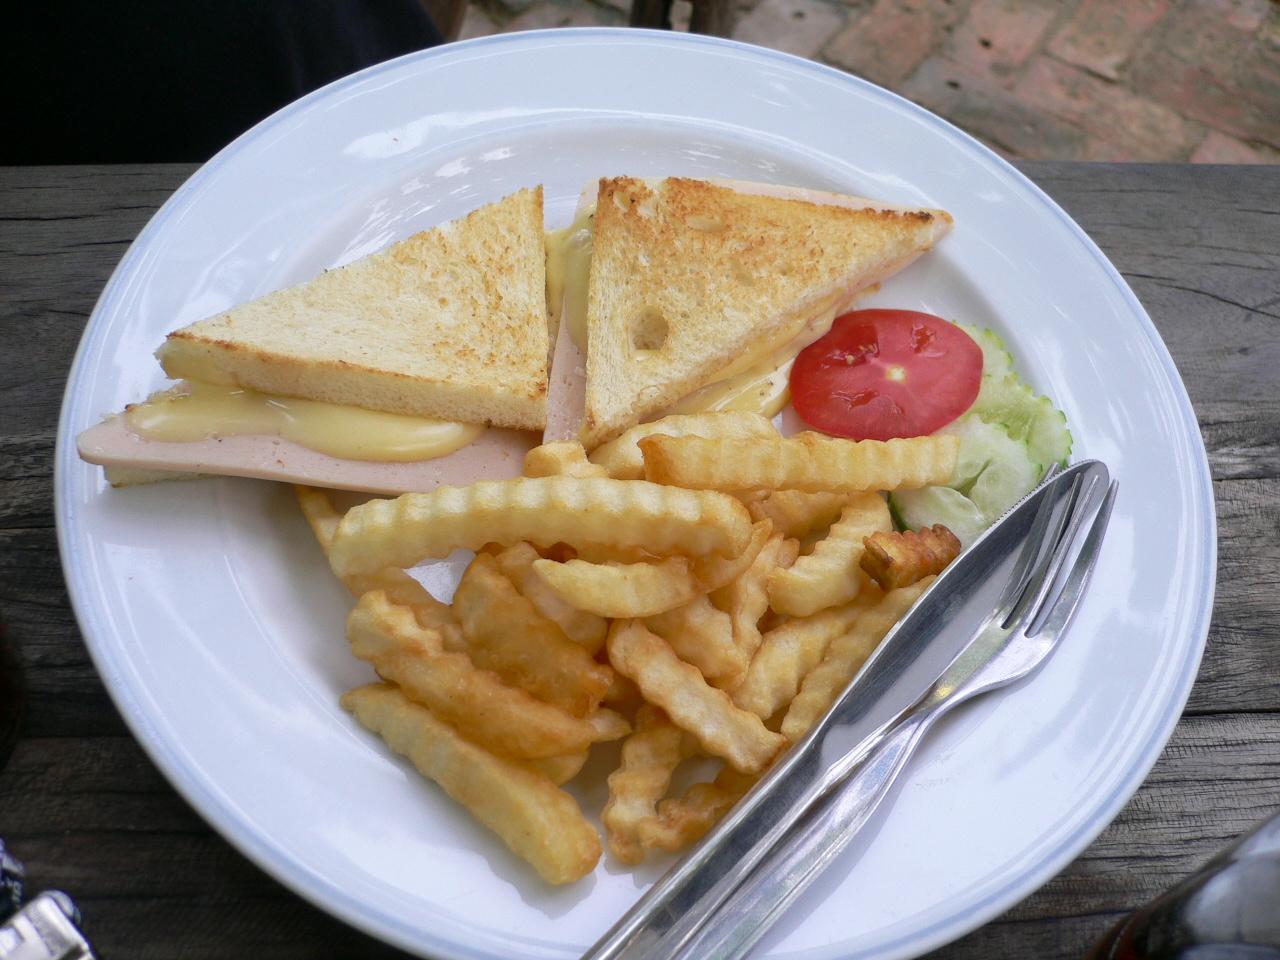 https://foodloader.net/xSh_2007-07-20_Toast_French_Fries.jpg